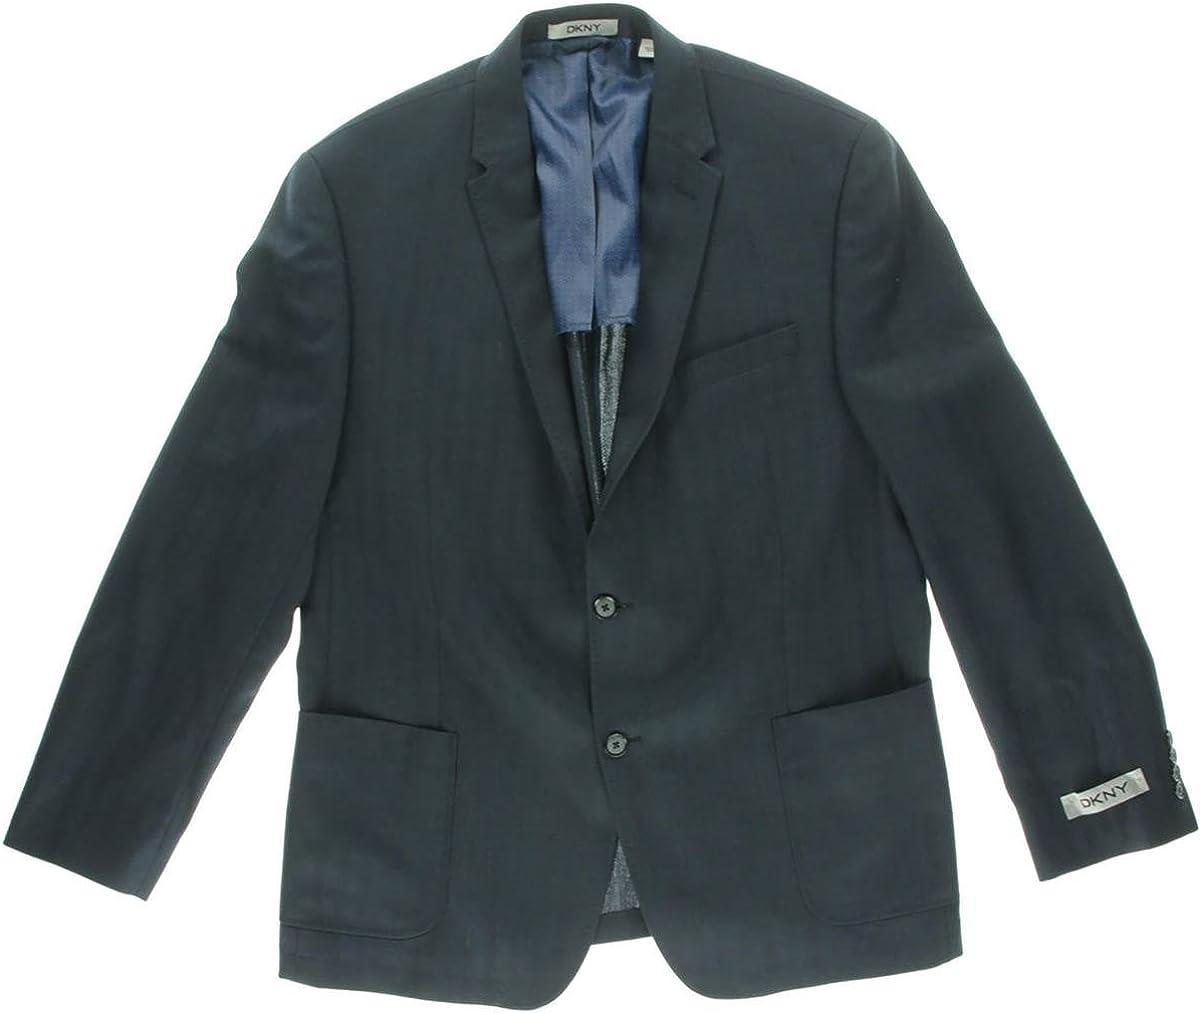 DKNY Slim Fit Navy Blue Herrignbone Half Lined Wool Blazer with Patch Pockets